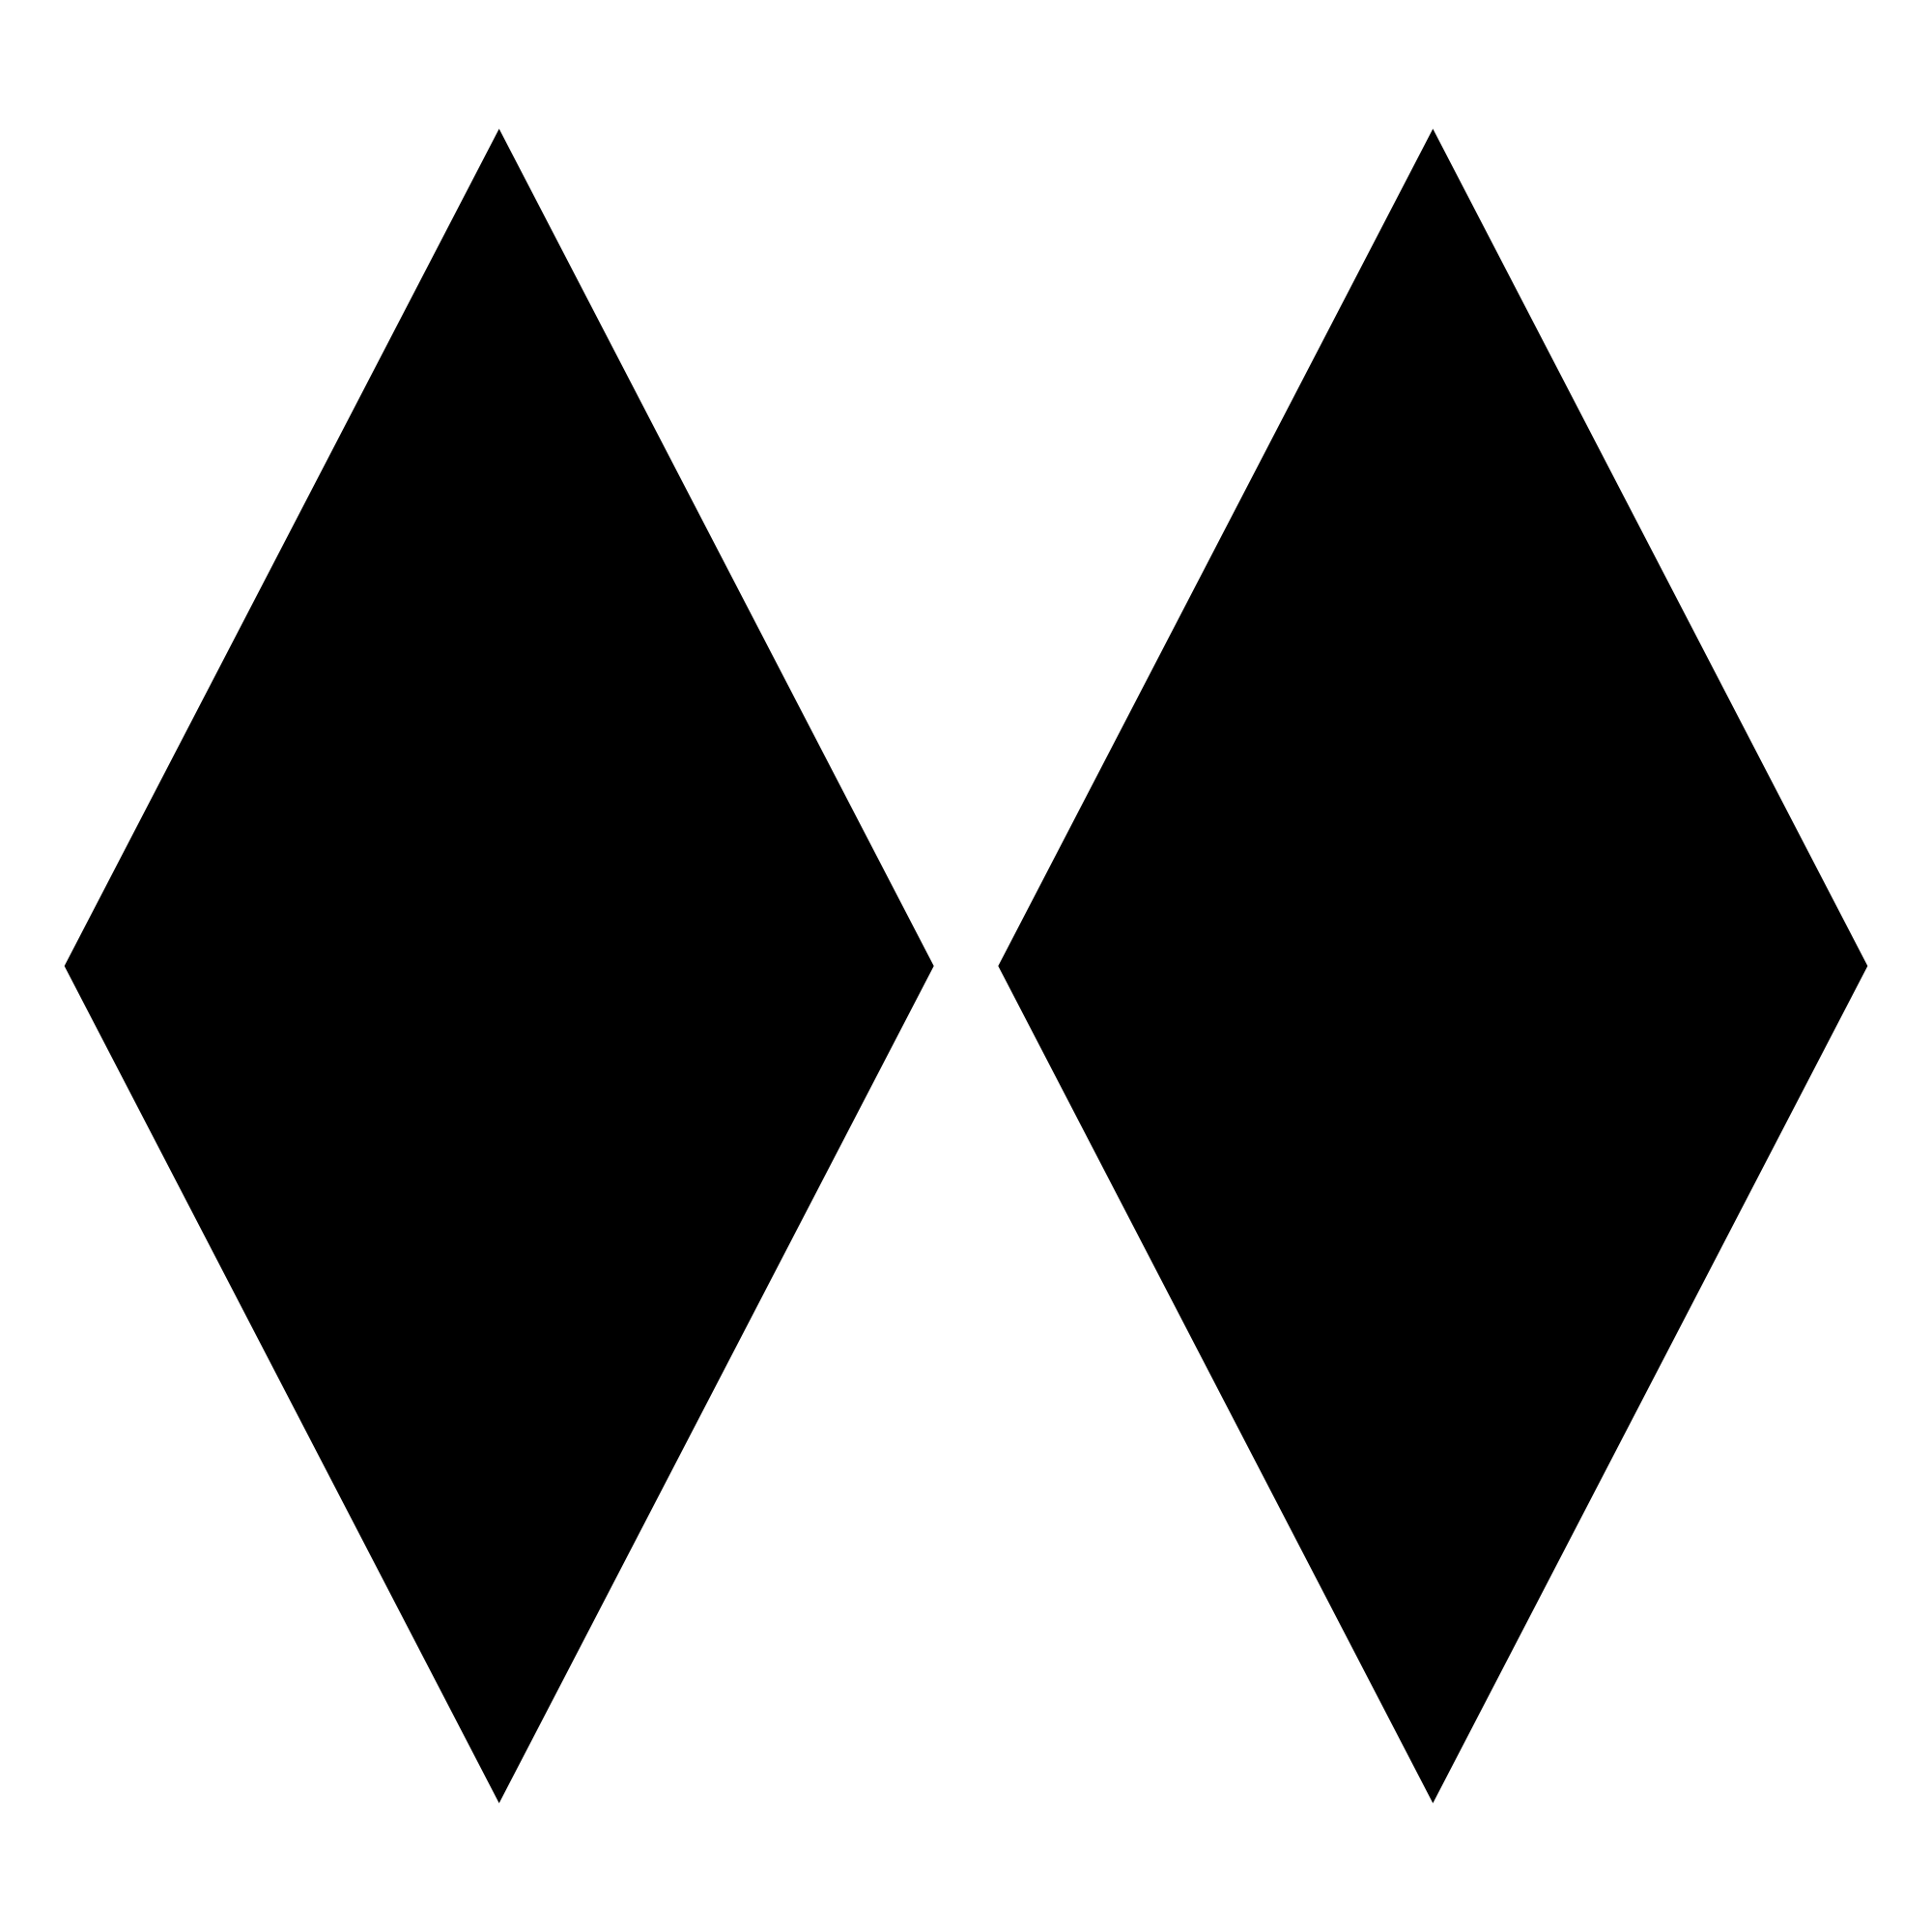 Clipart diamond sign. File ski trail rating